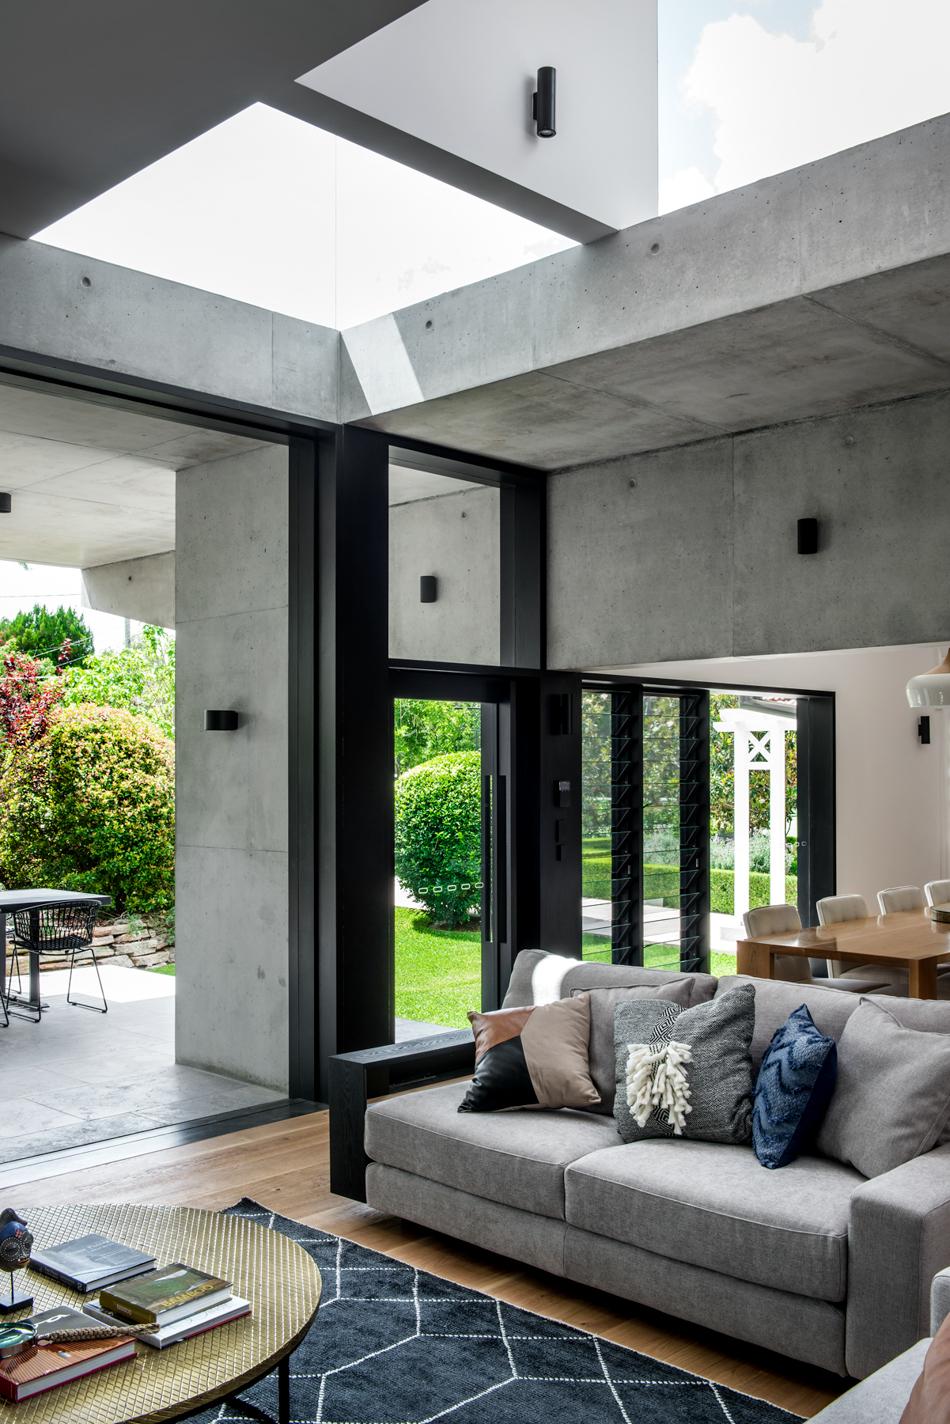 the-terrace-shaun-lockyer-architects-the-design-emotive-12.jpg